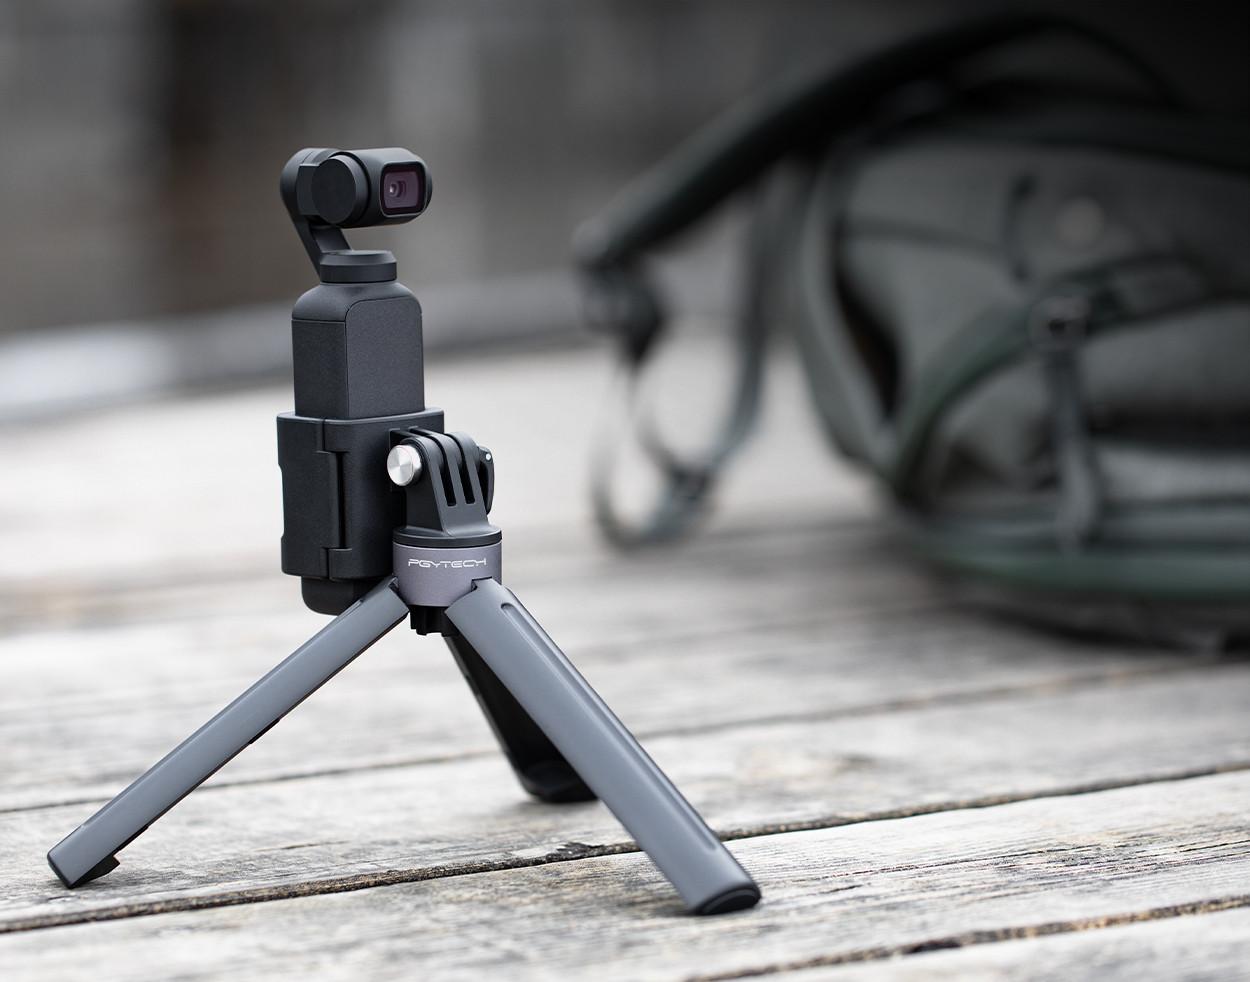 OSMO-POCKET-运动相机四分之一接口转接座-英文版_01.jpg